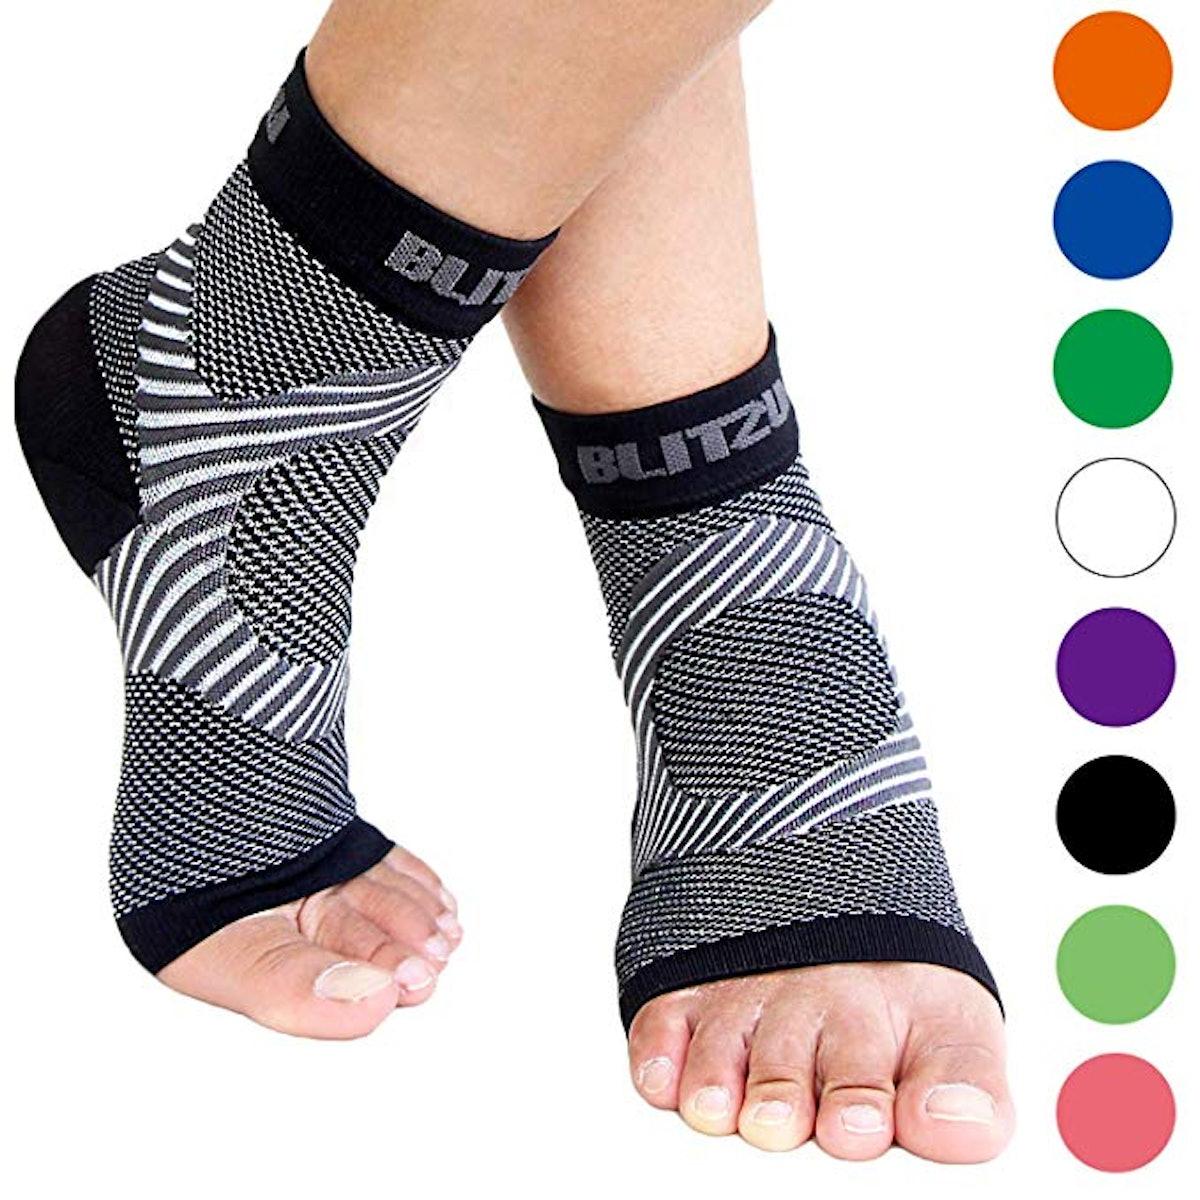 BLITZU Plantar Fasciitis Socks